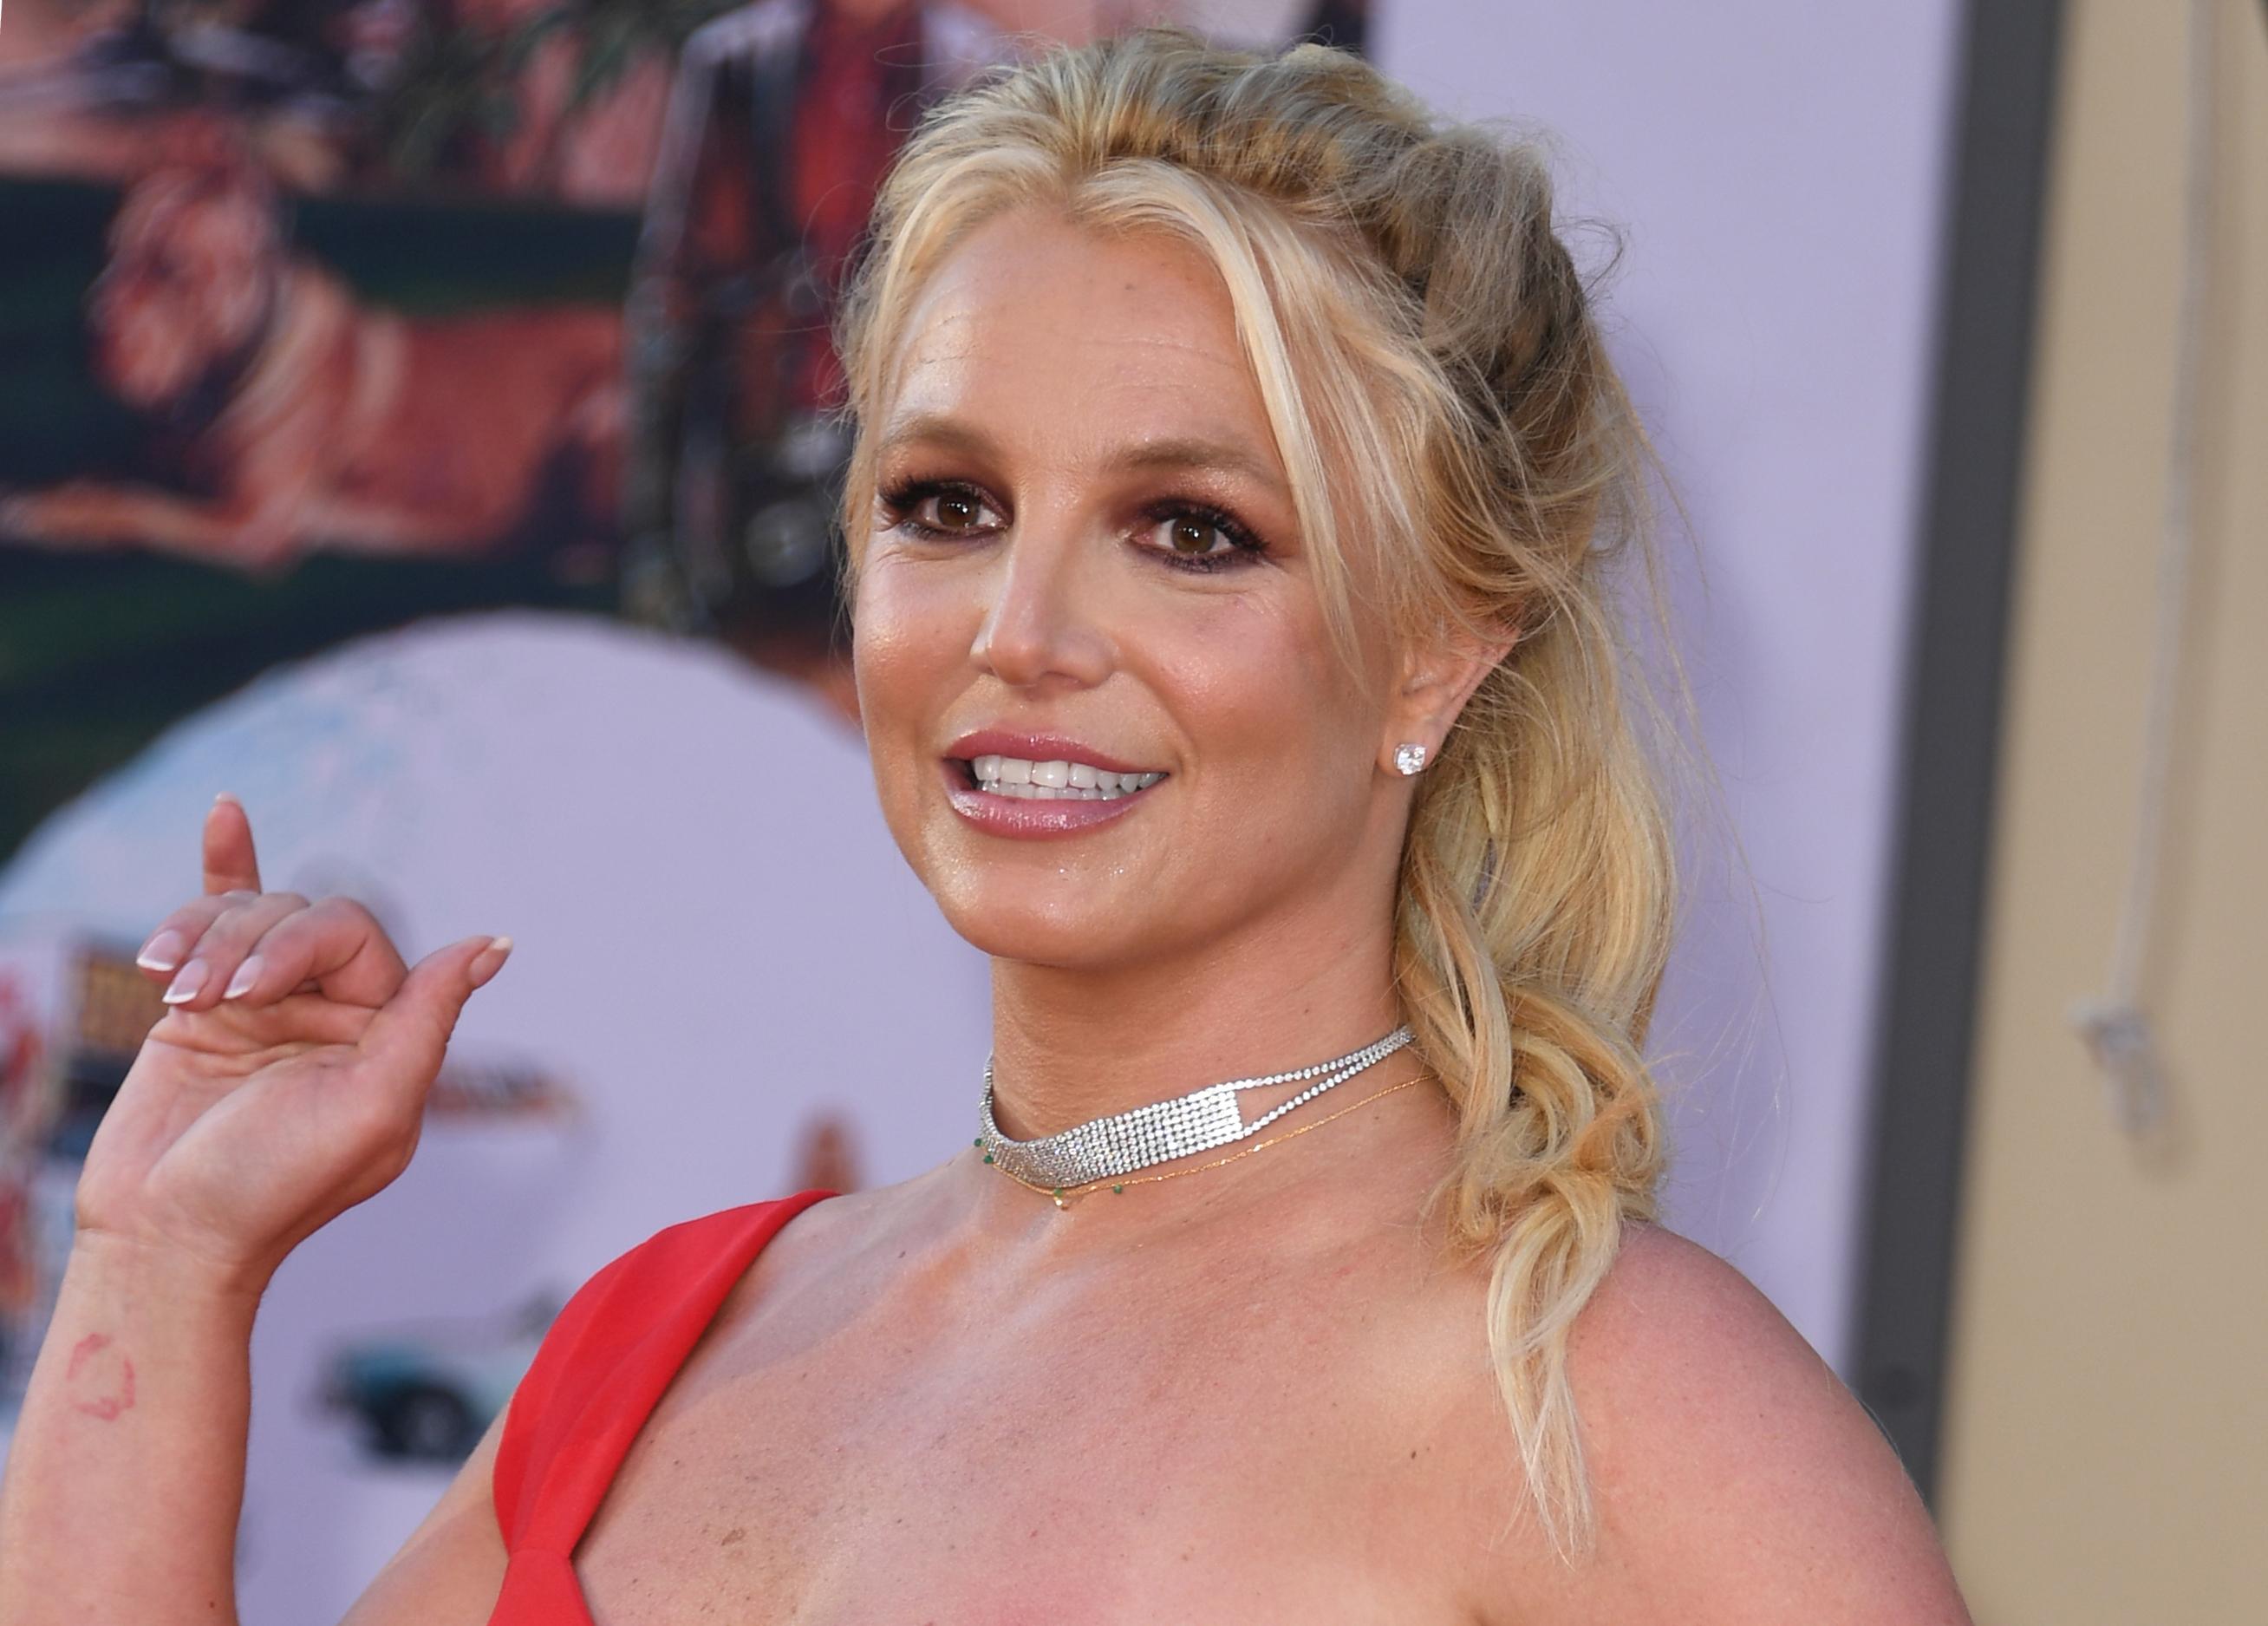 Celebs rally around Britney Spears